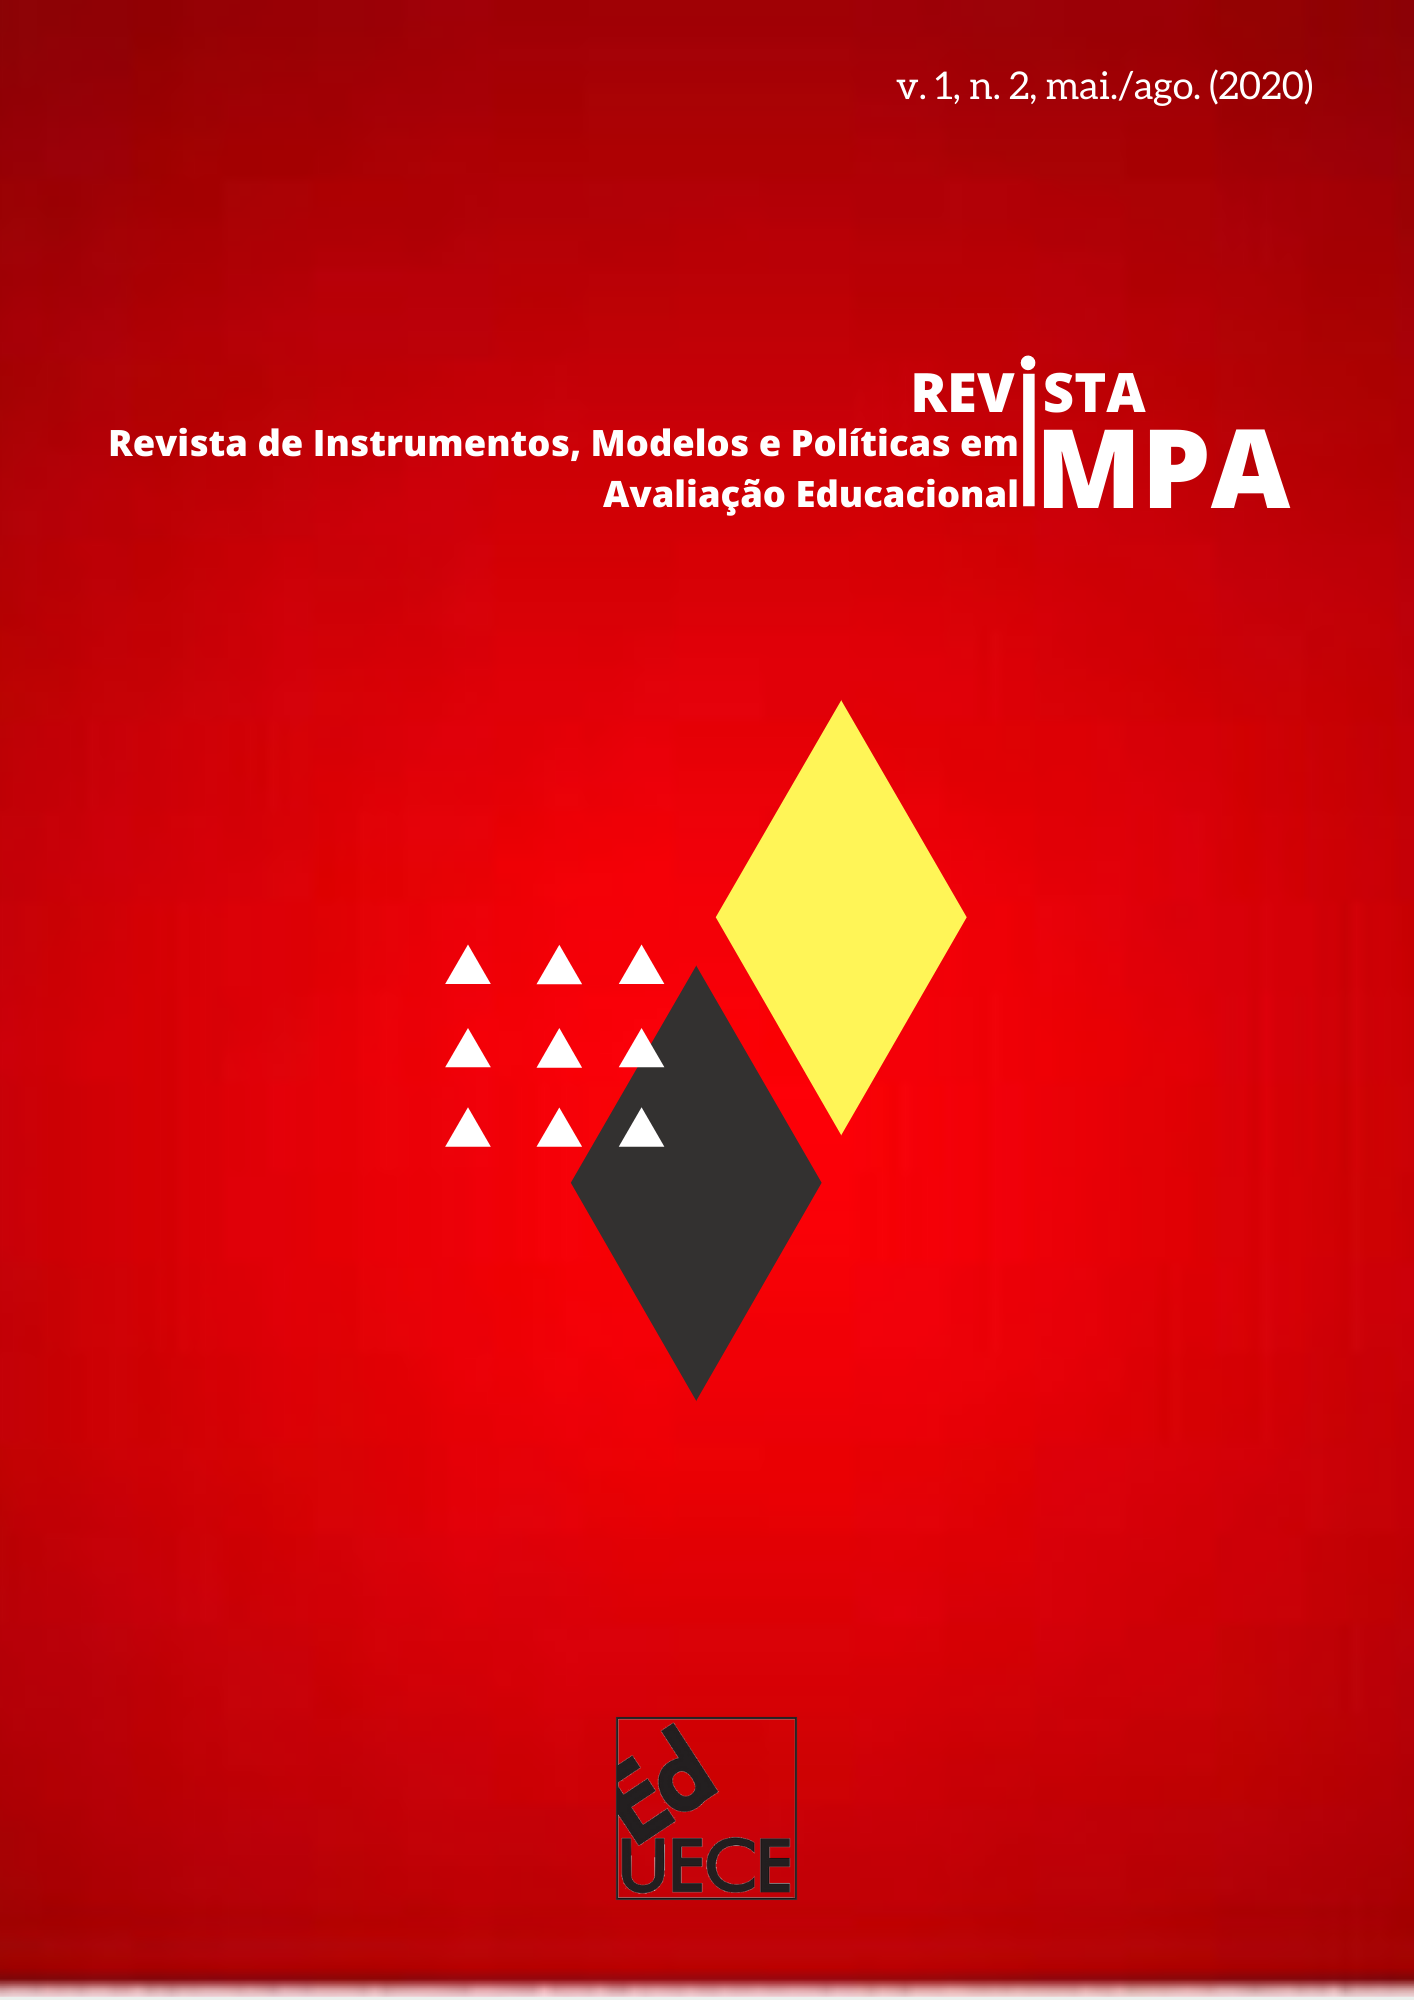 Revista Impa